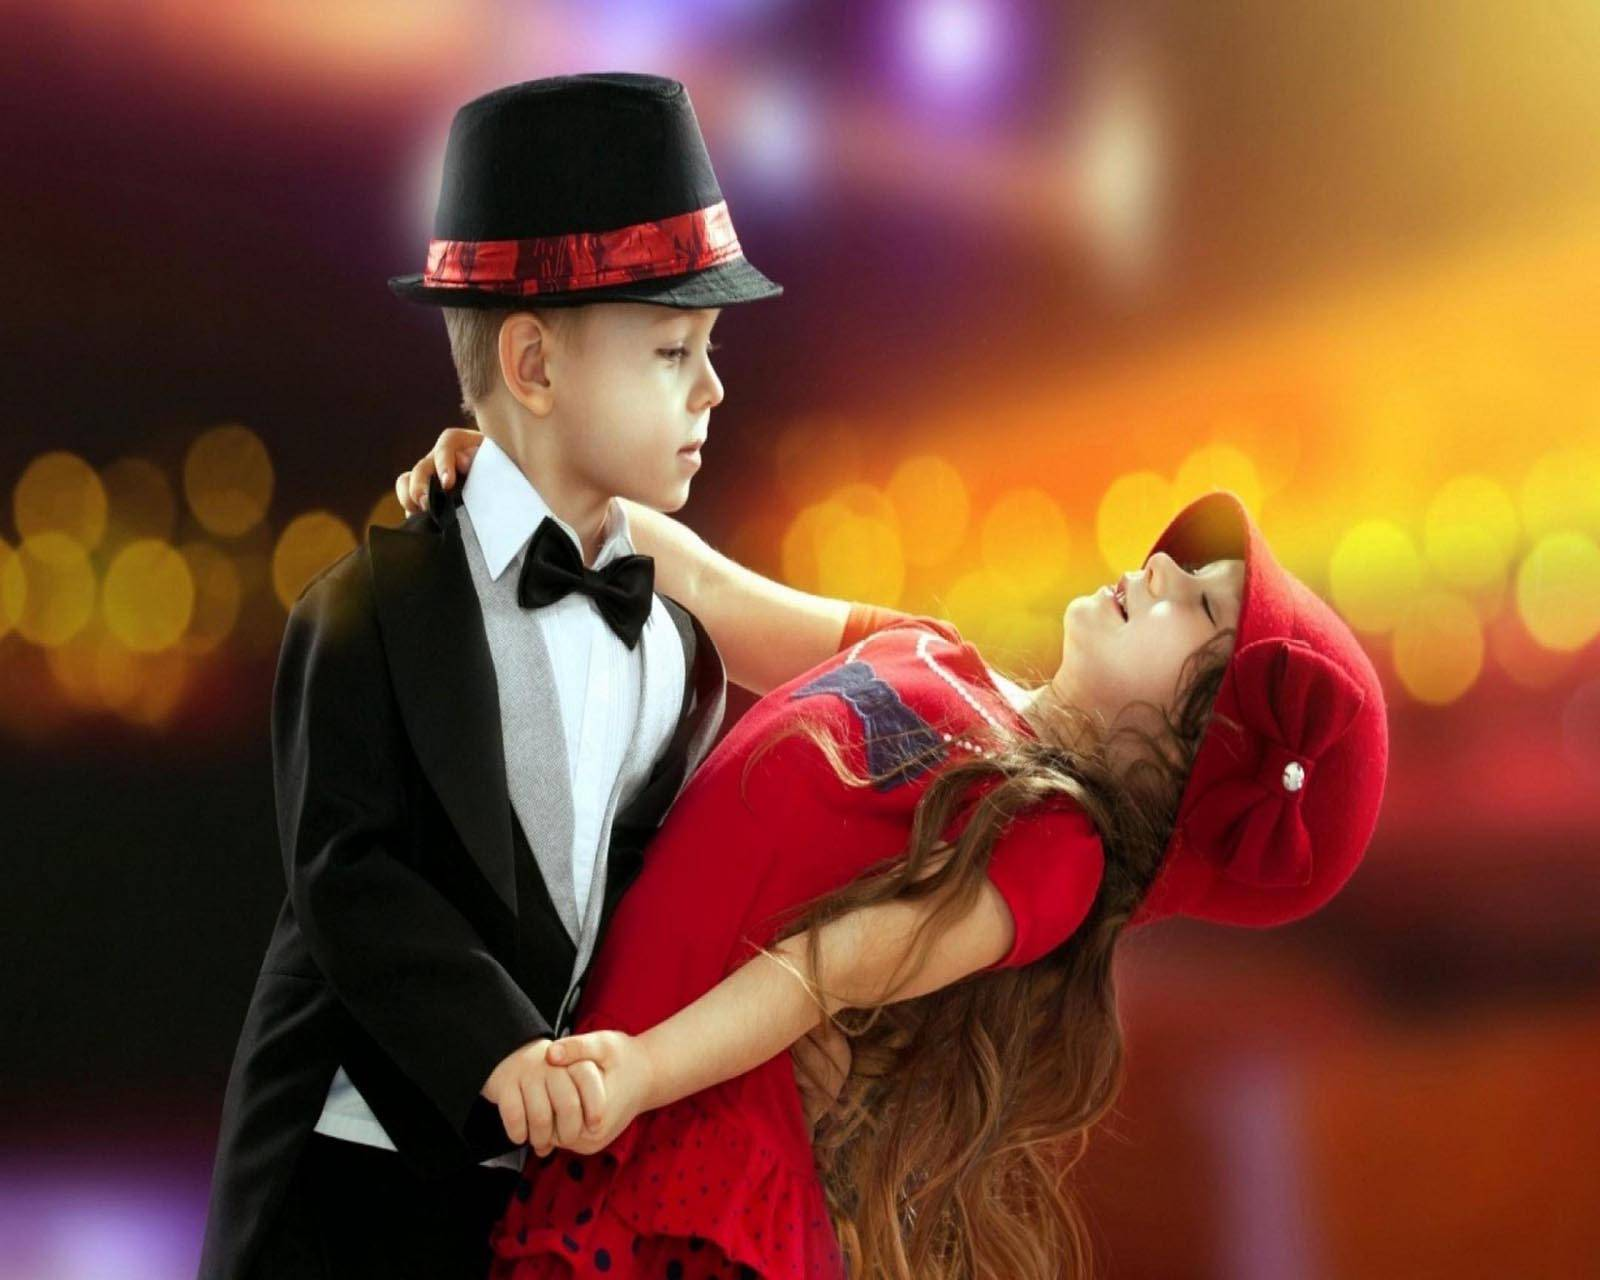 Romantic kids dance